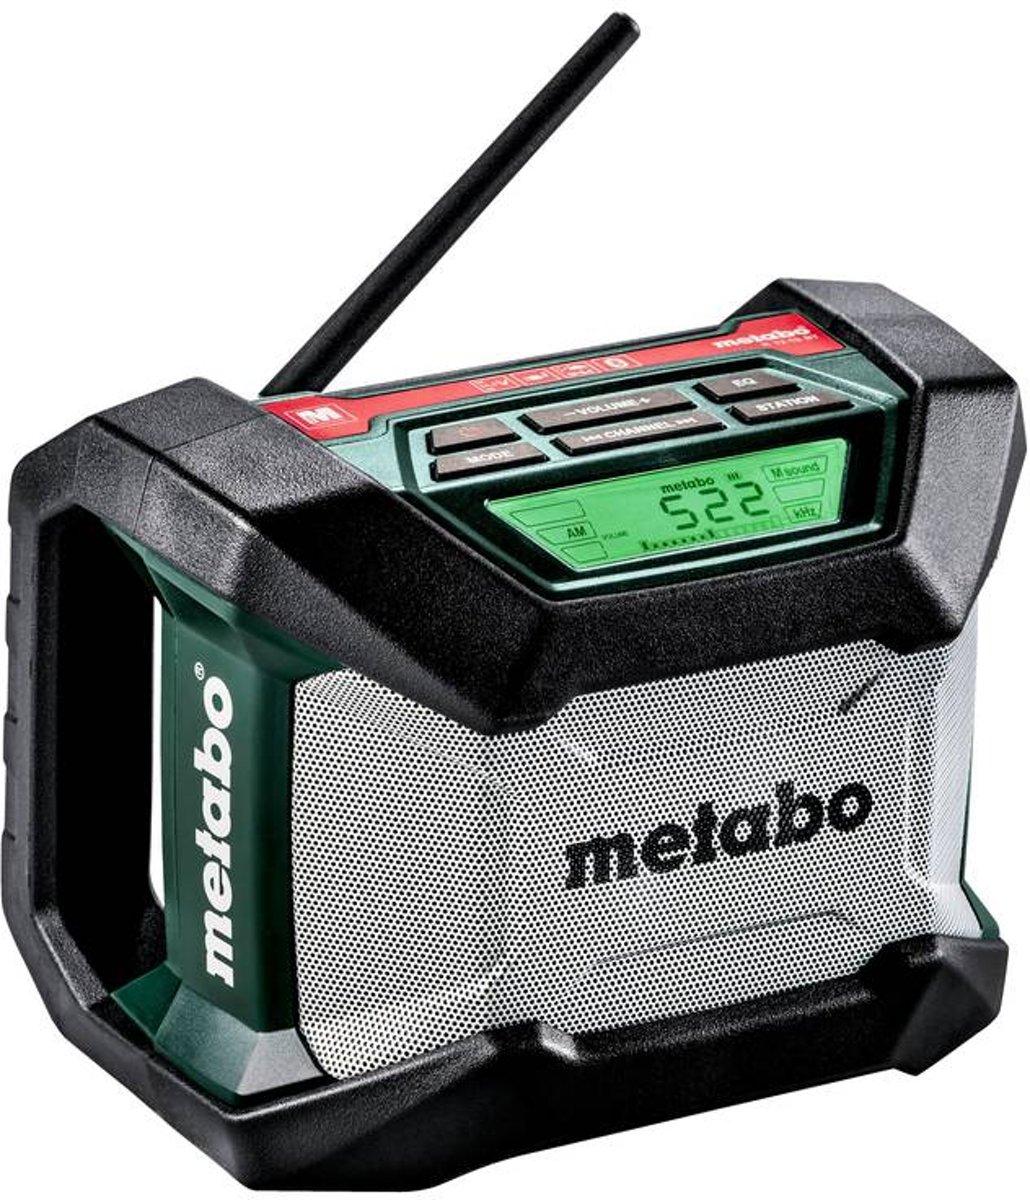 Metabo R 12-18 BT FM Bouwradio Bluetooth Zwart, Groen, Grijs